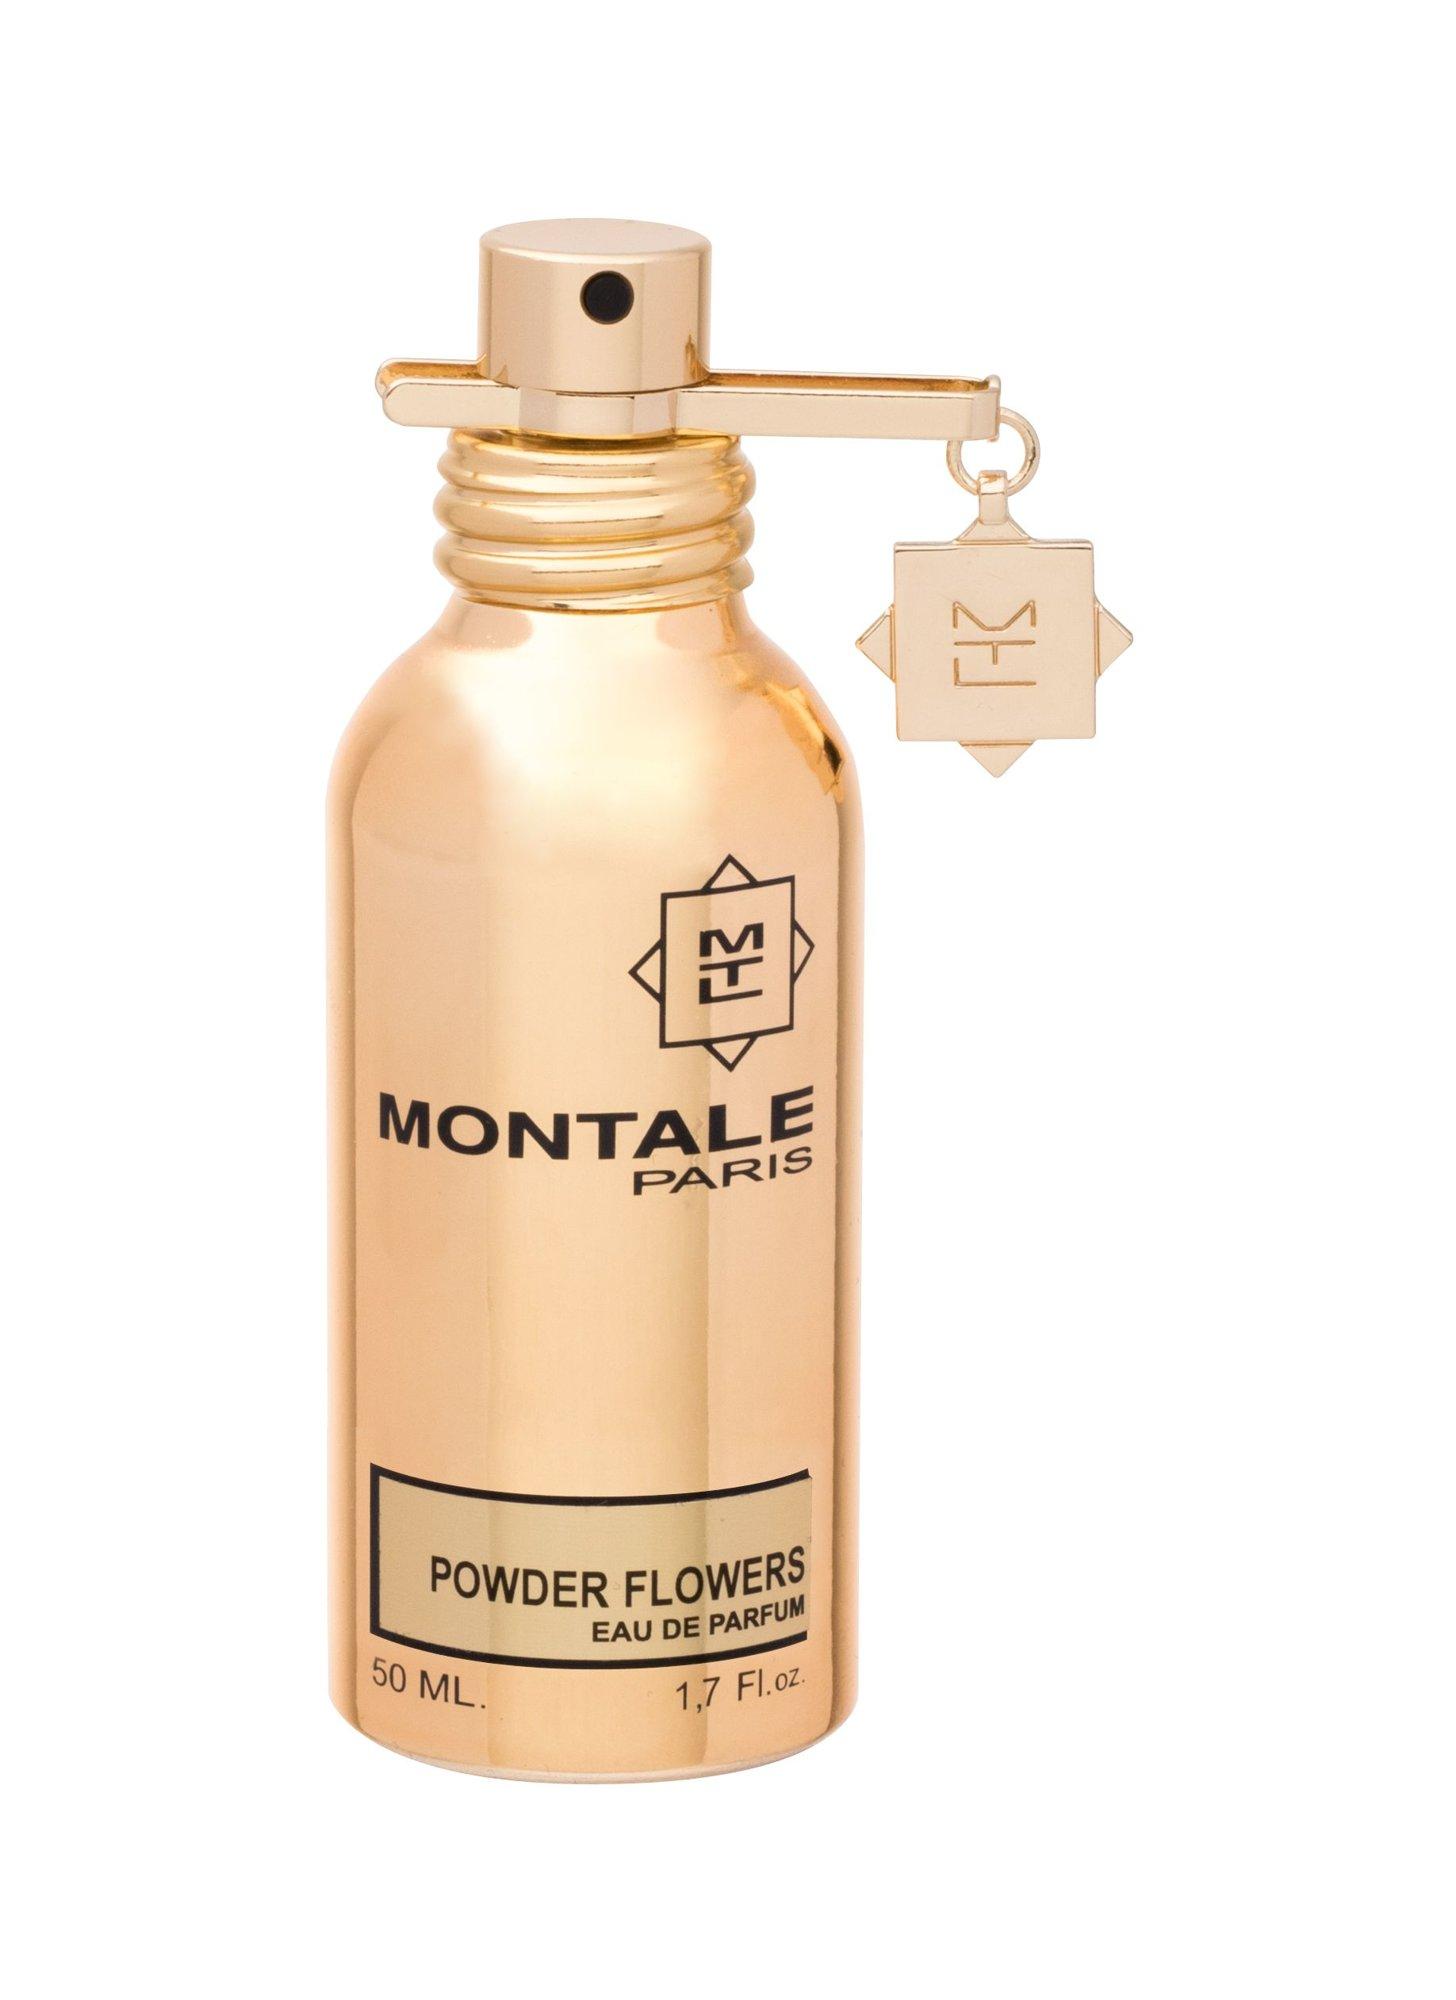 Montale Paris Powder Flowers EDP 50ml